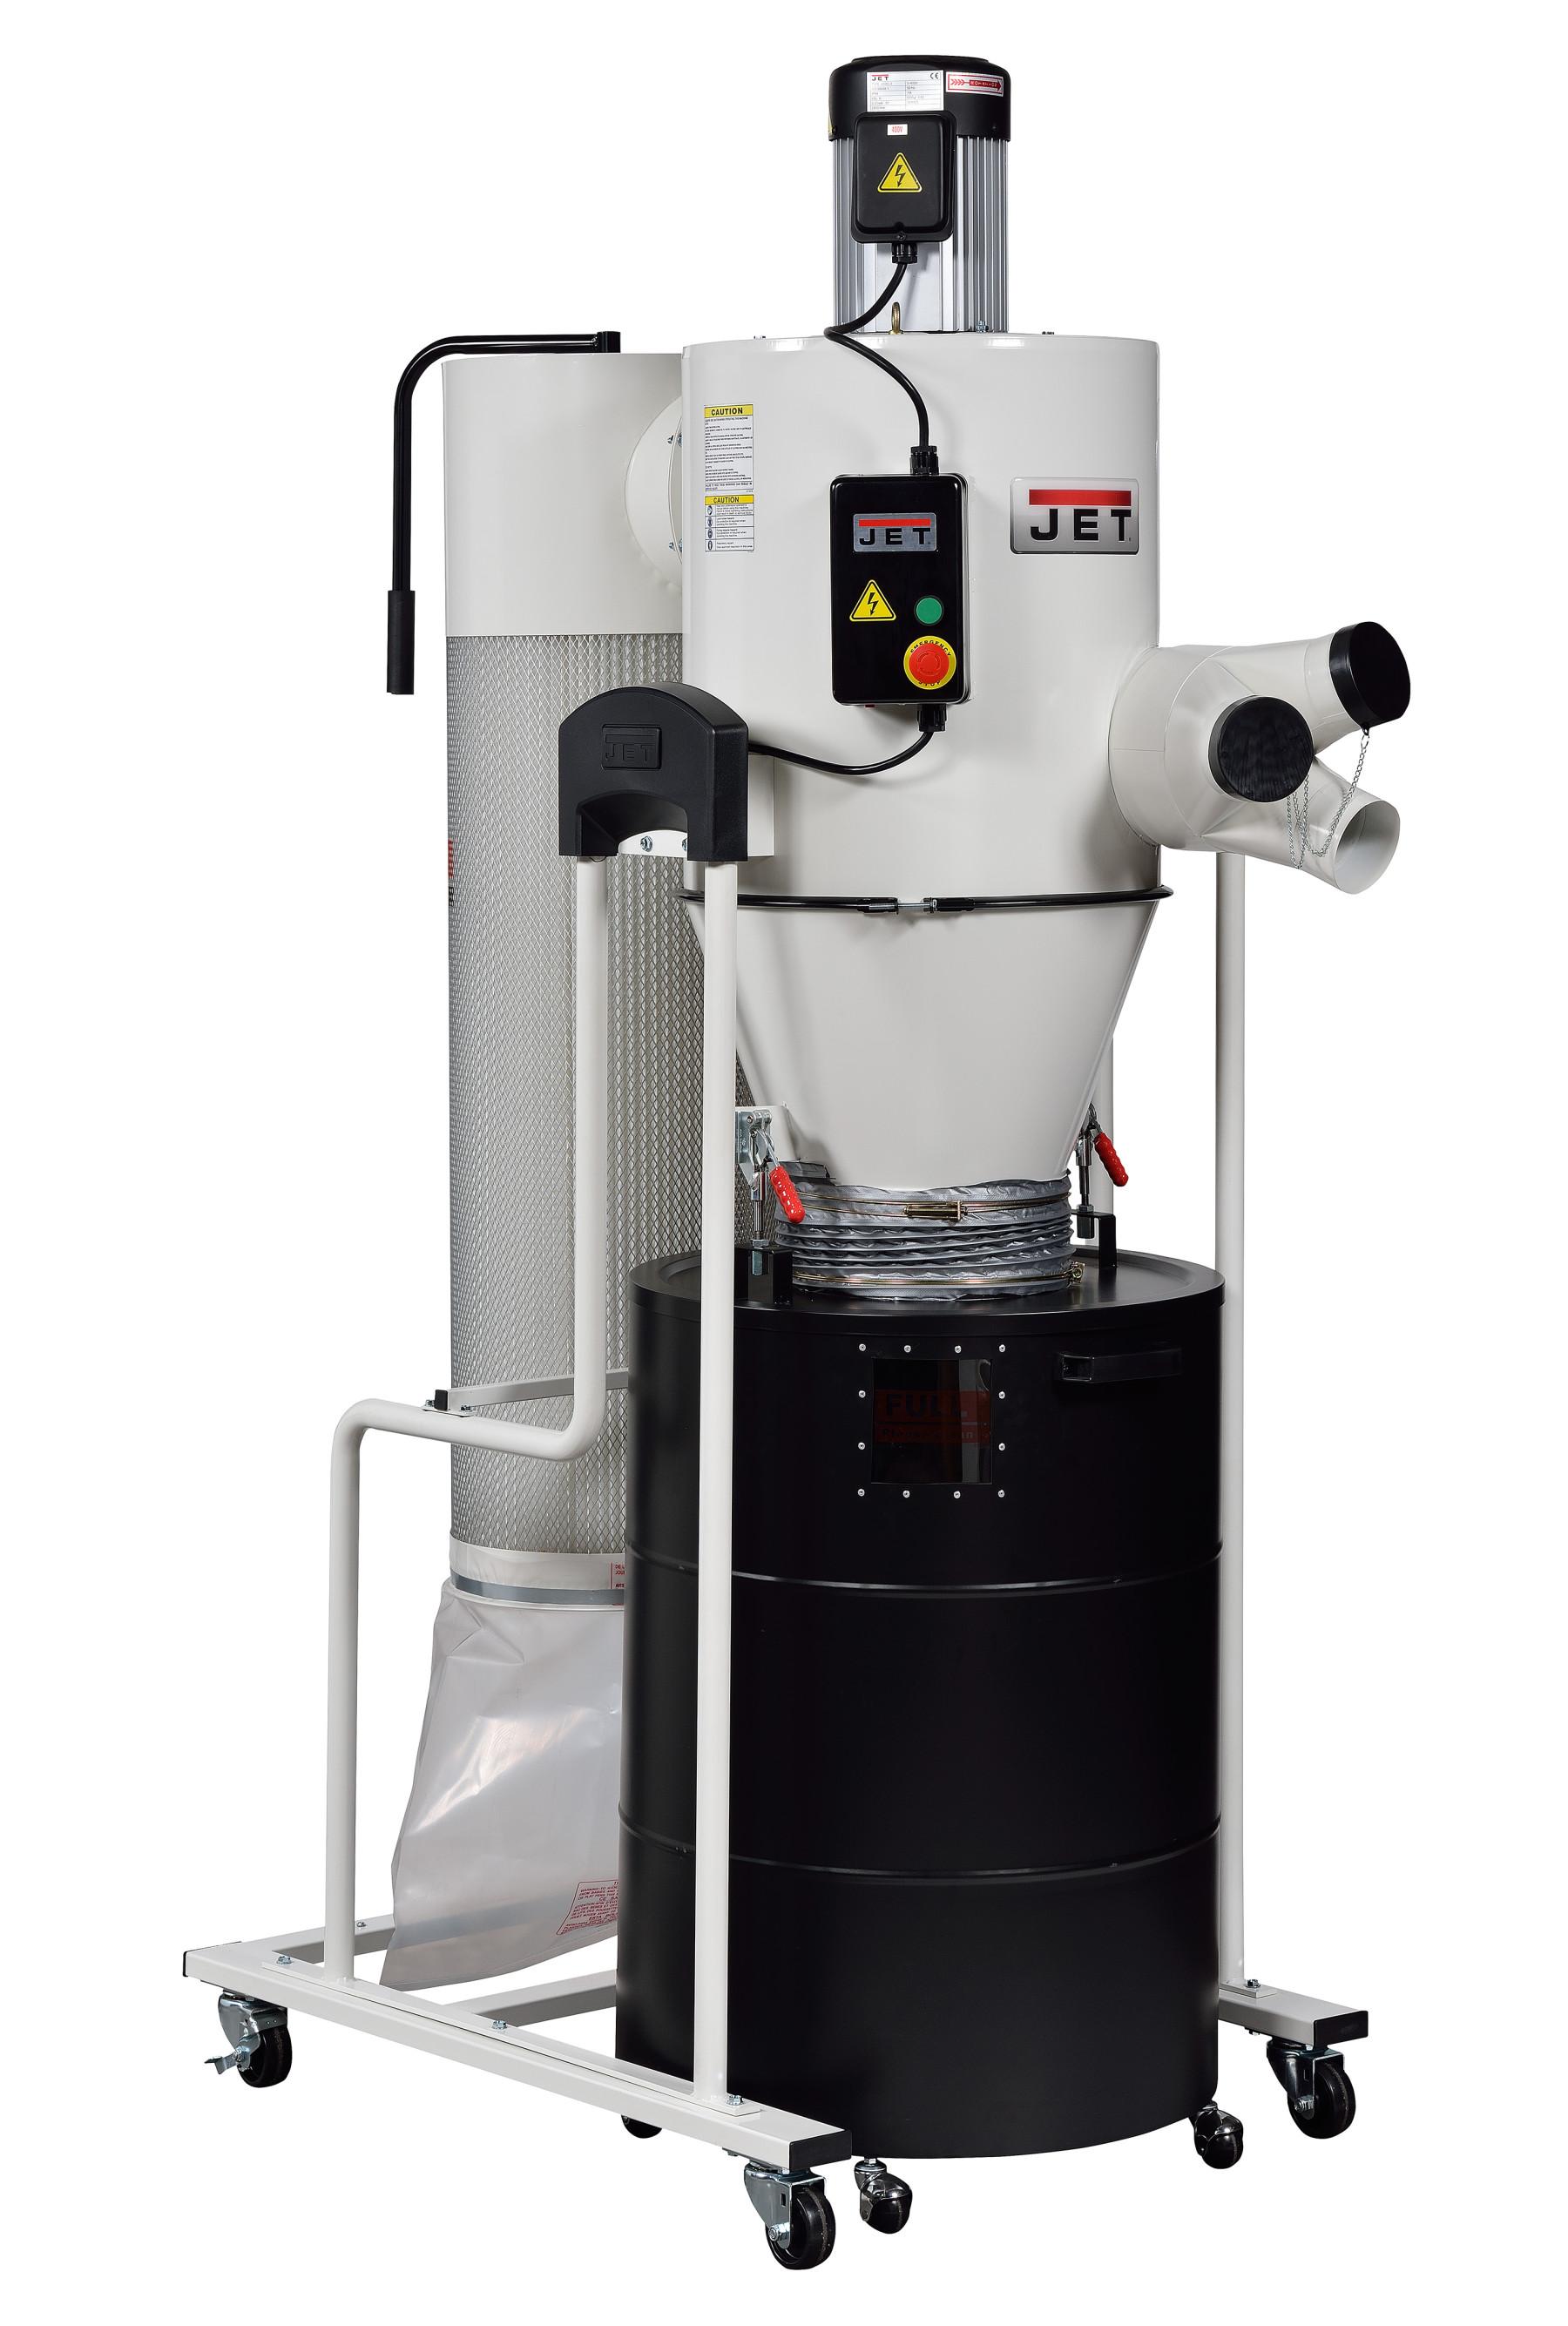 JCDC-3 Витяжна установка циклон фото 1